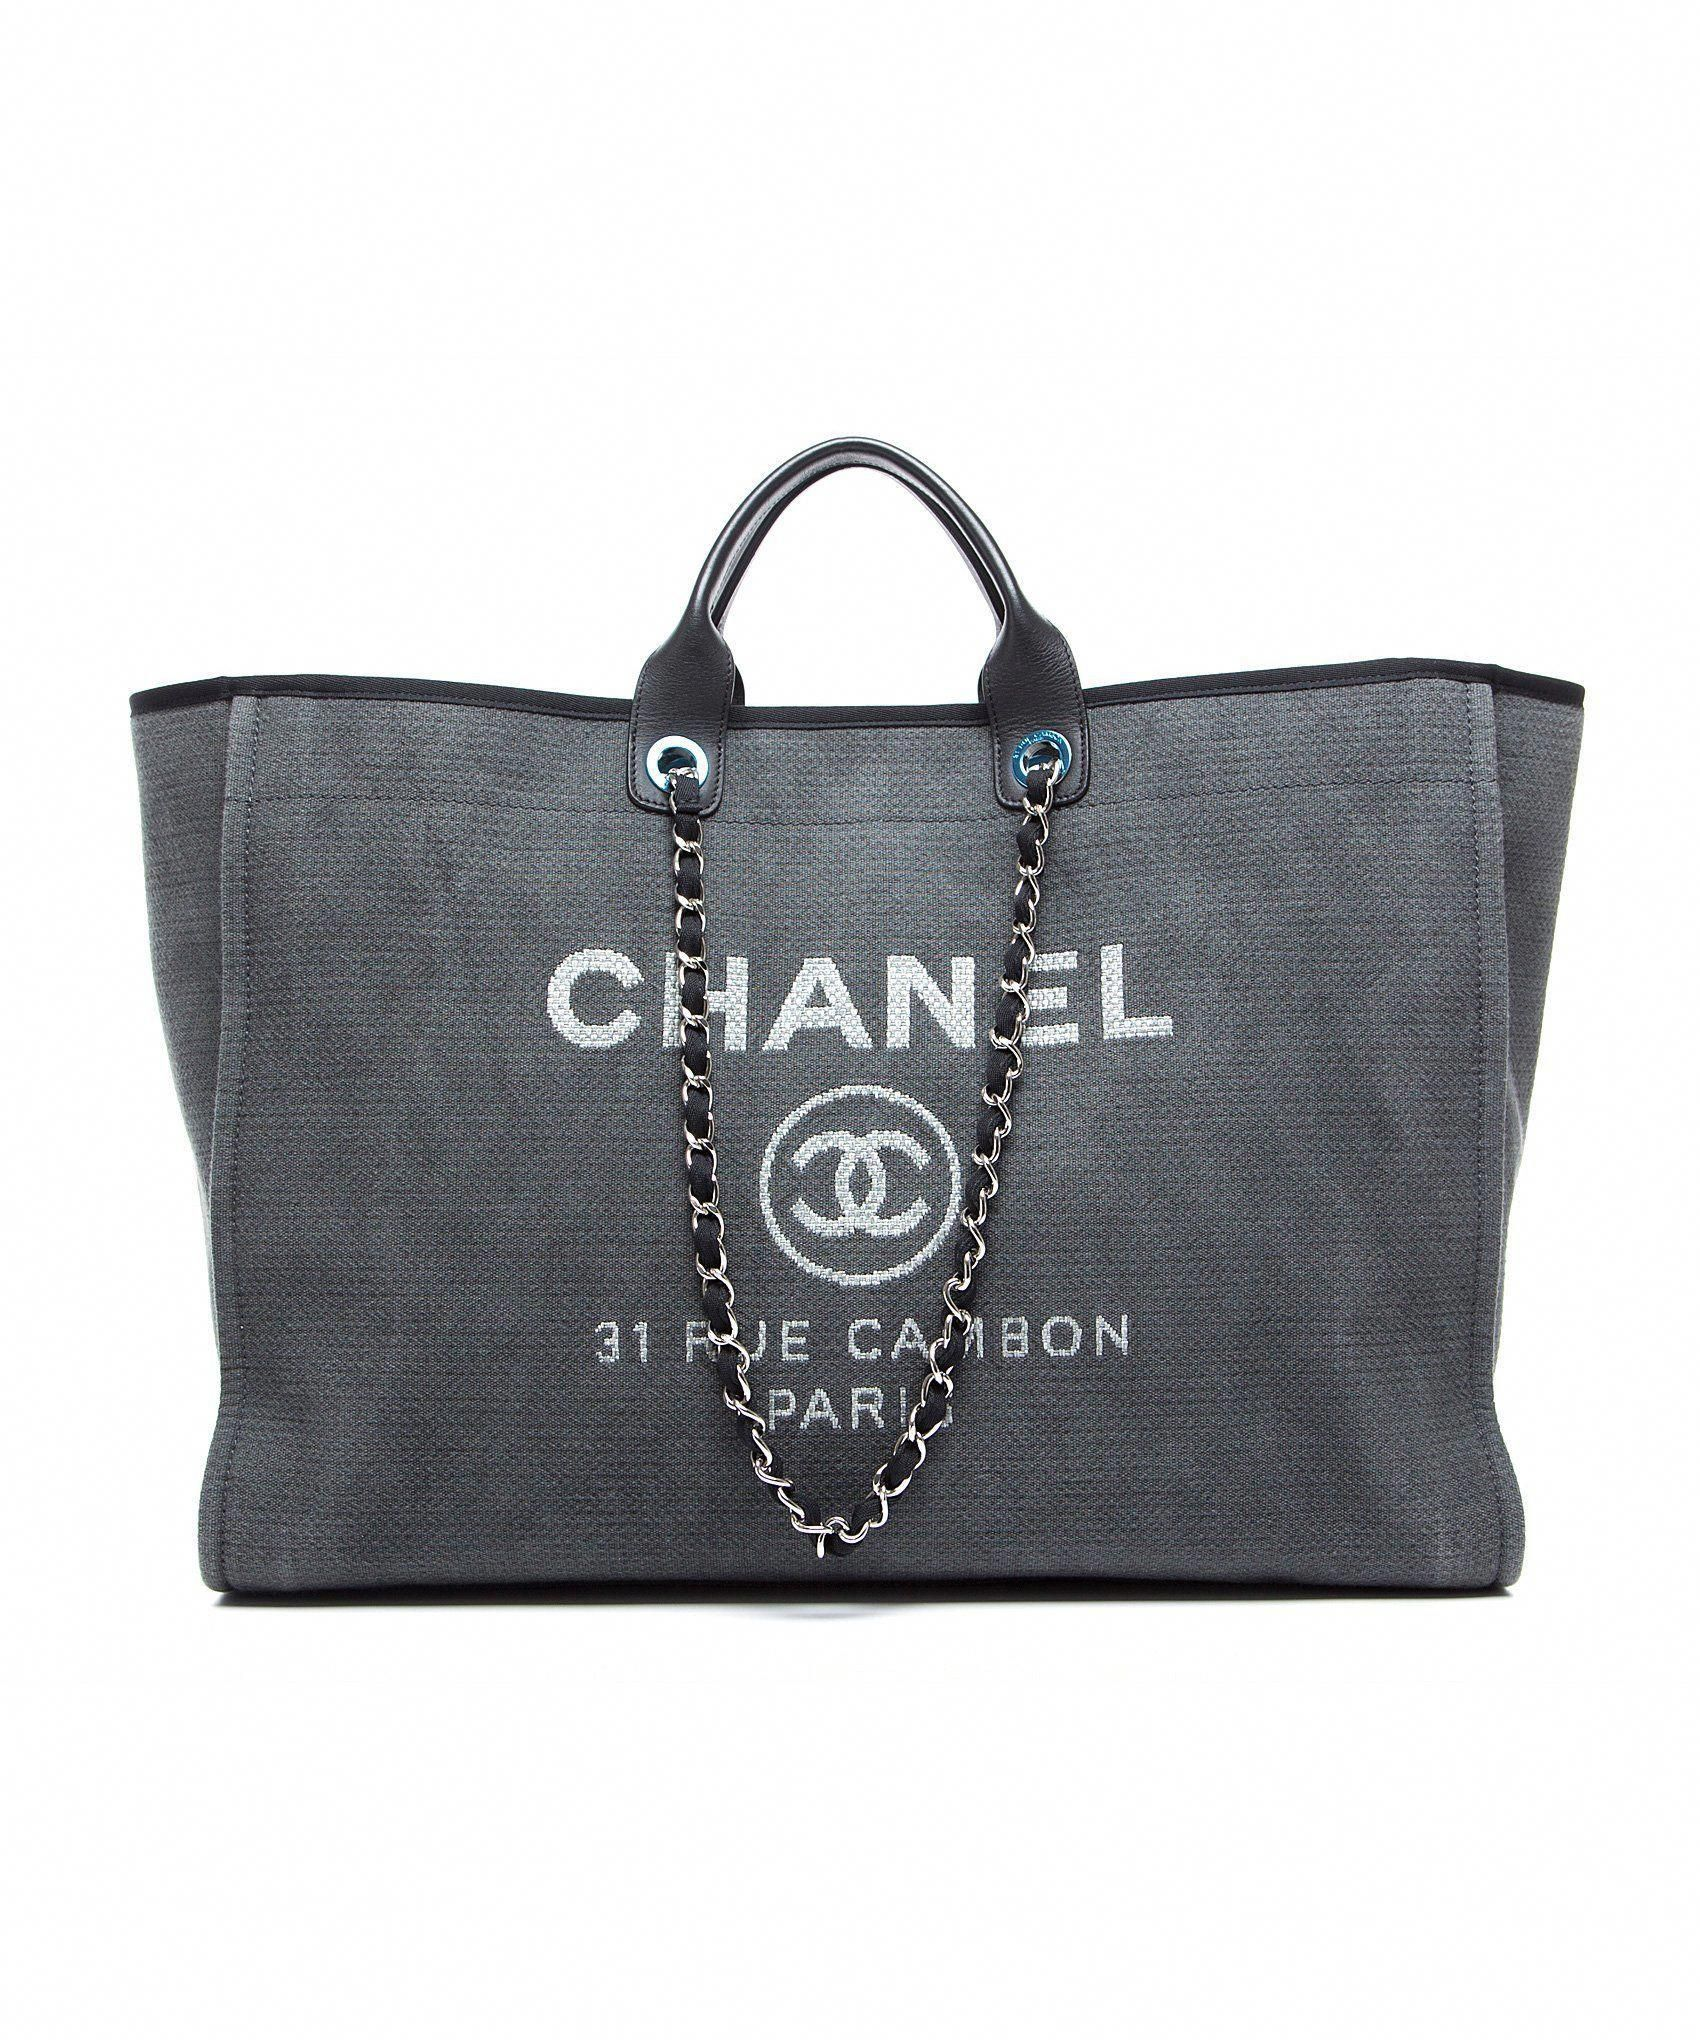 071b25b31e01 NEW 2016 Chanel Deauville Grey Canvas Black Trim Grand Shopper Large Tote  Bag